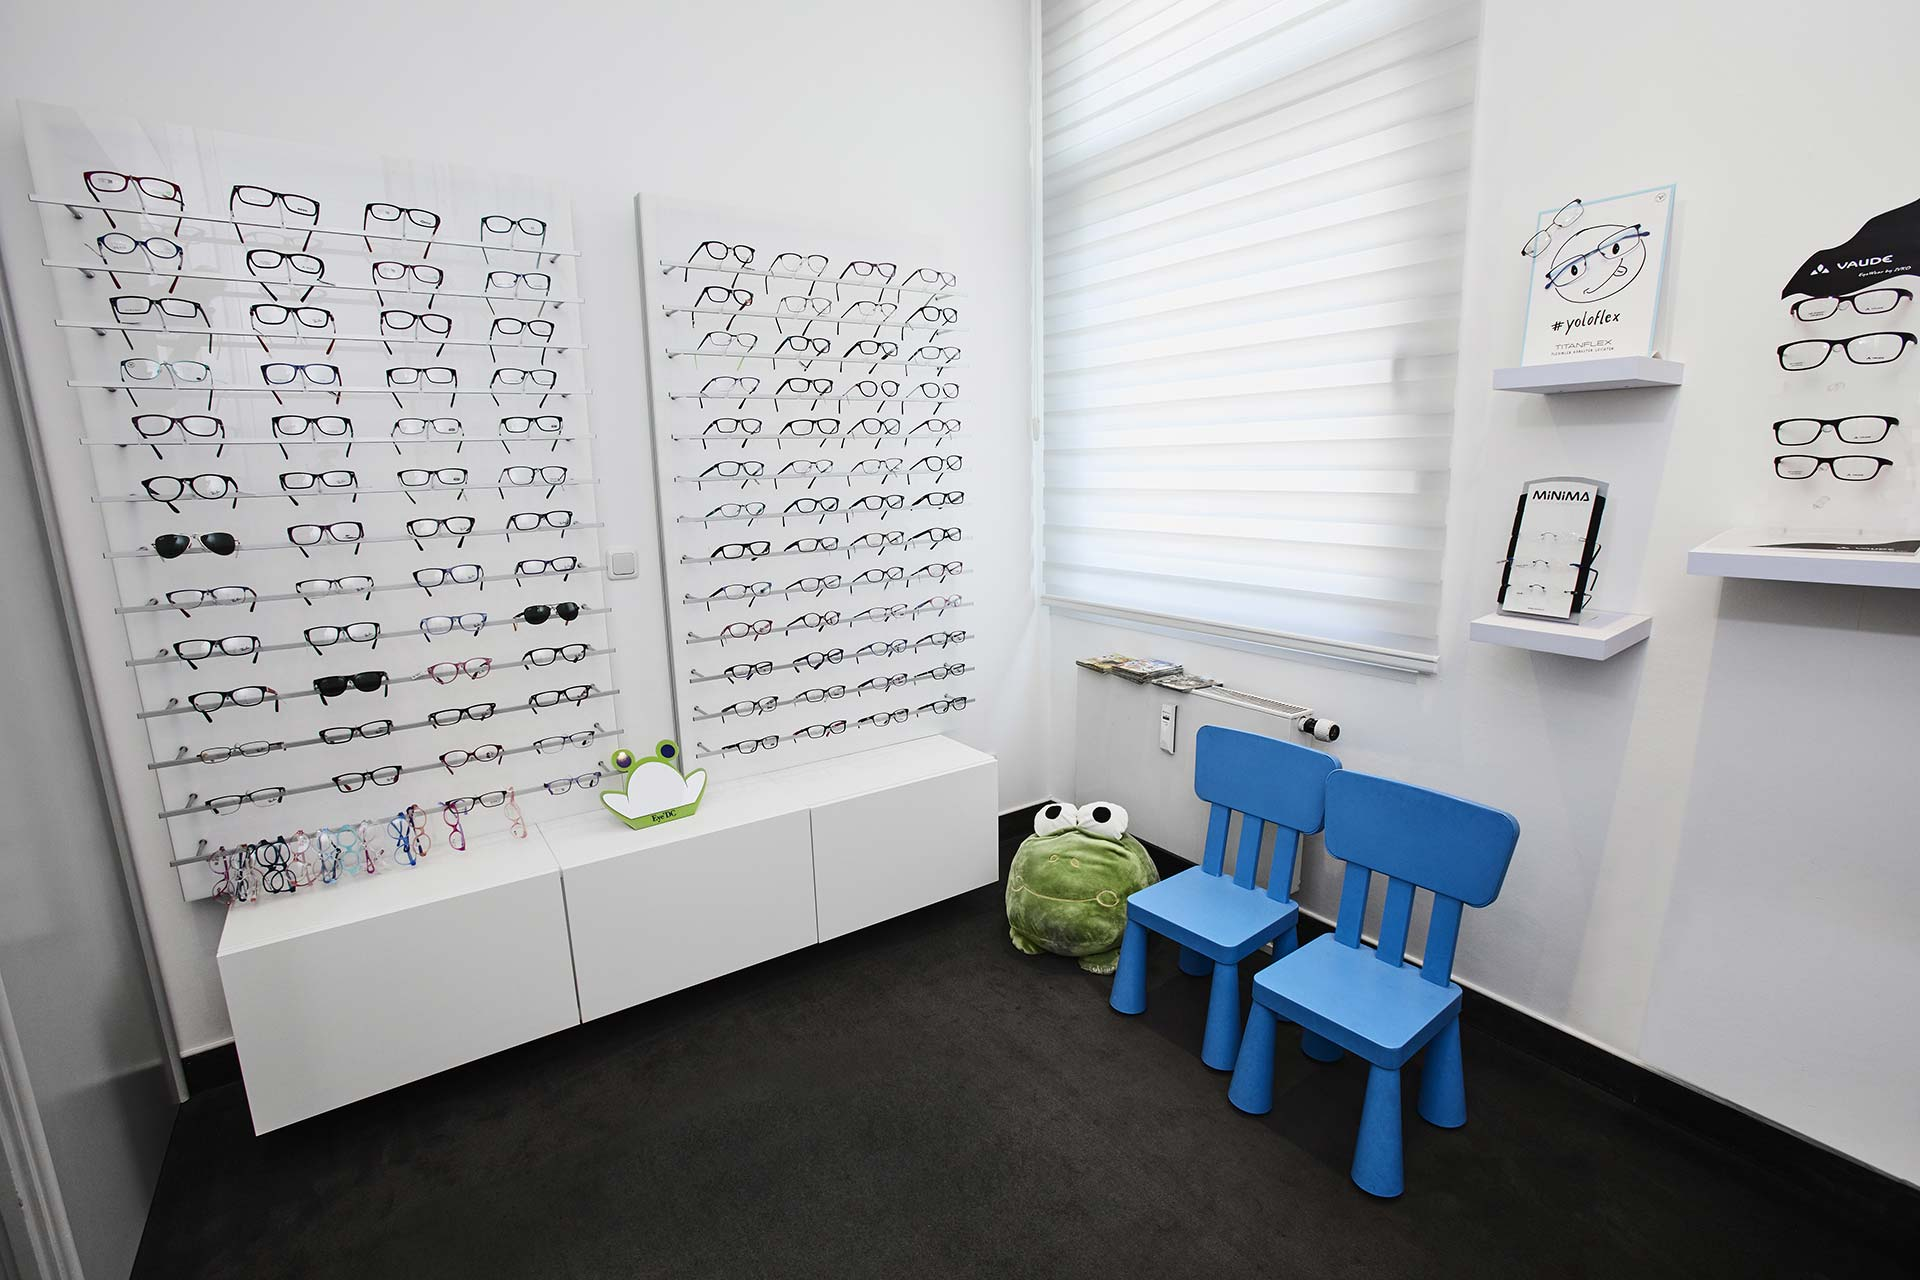 Kinderbrillen Beratung